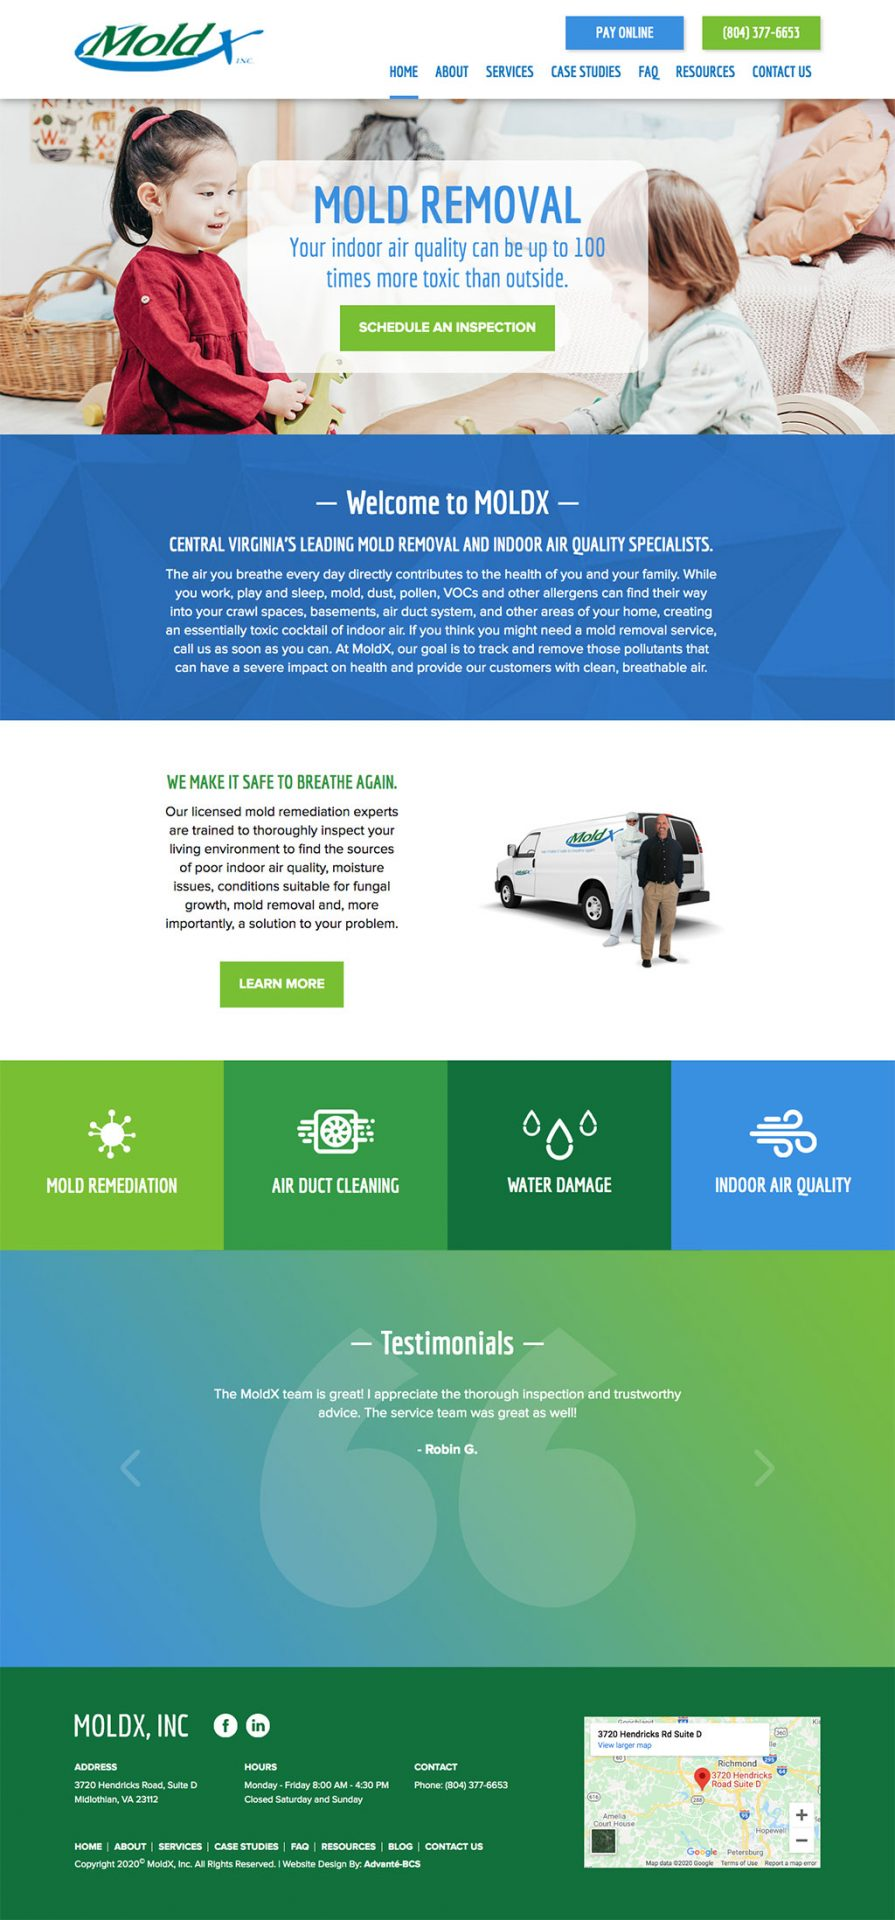 moldx-website-img